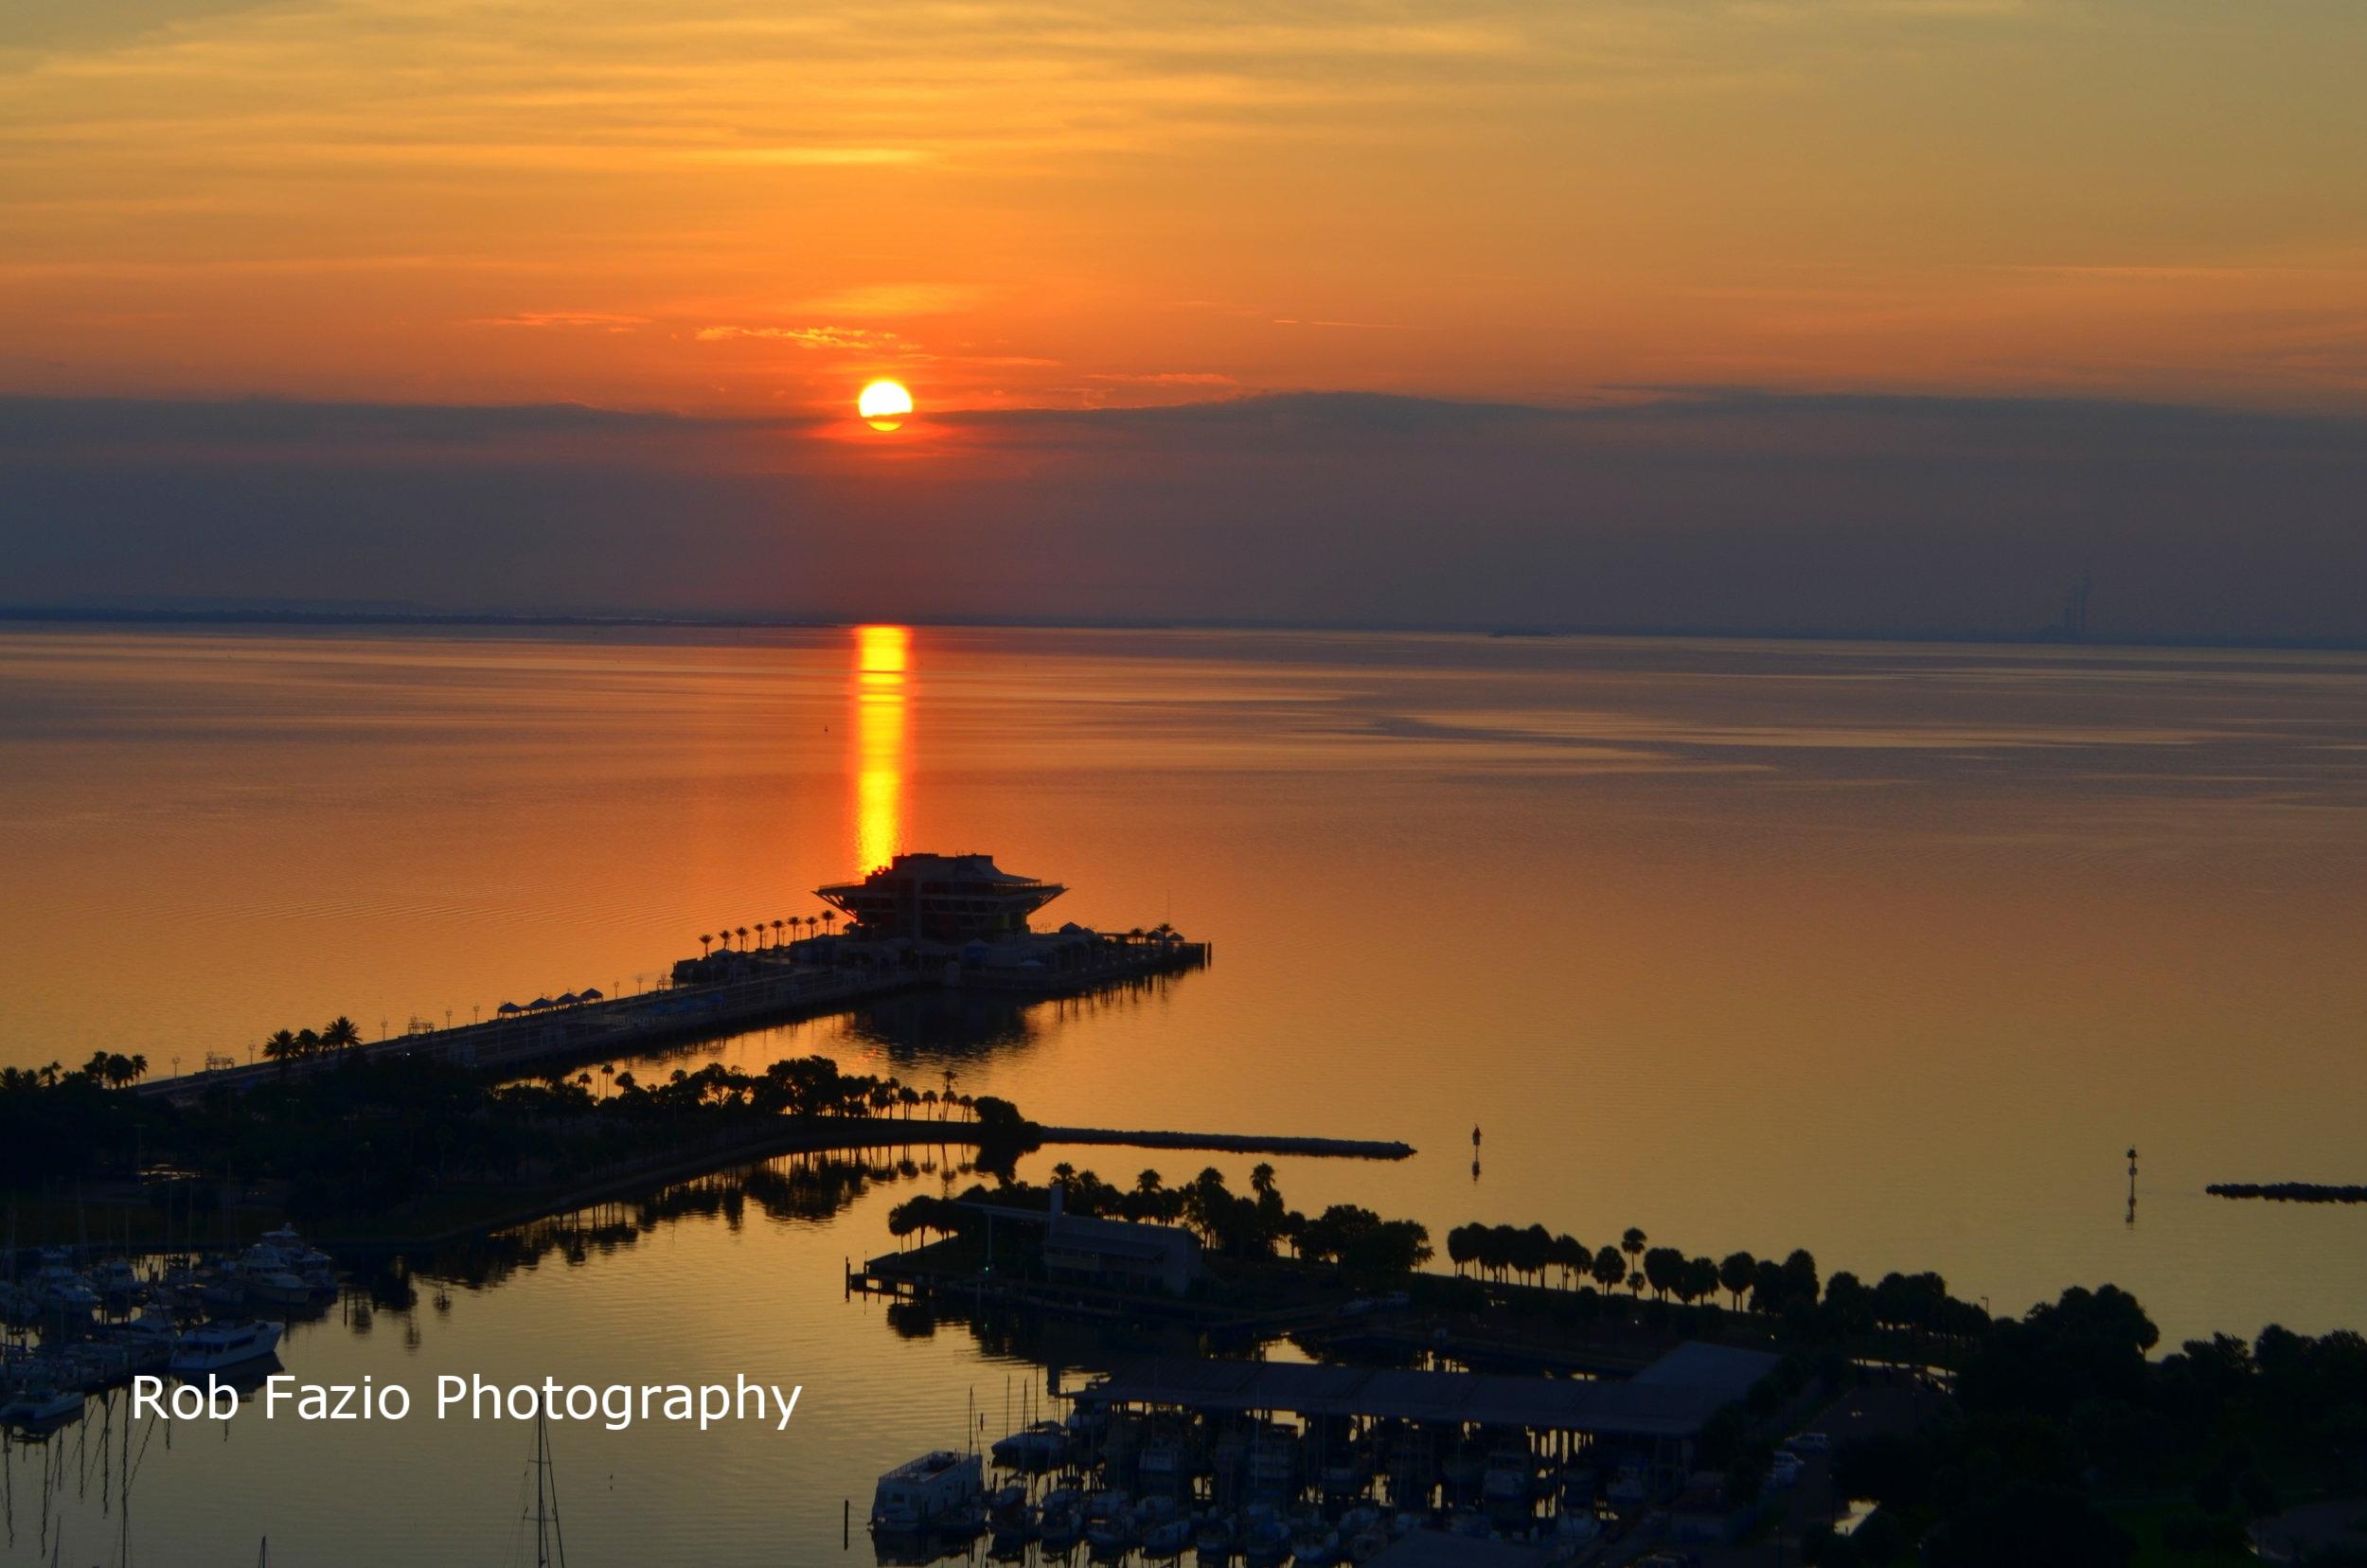 Sunrise Over Pyramid Pier